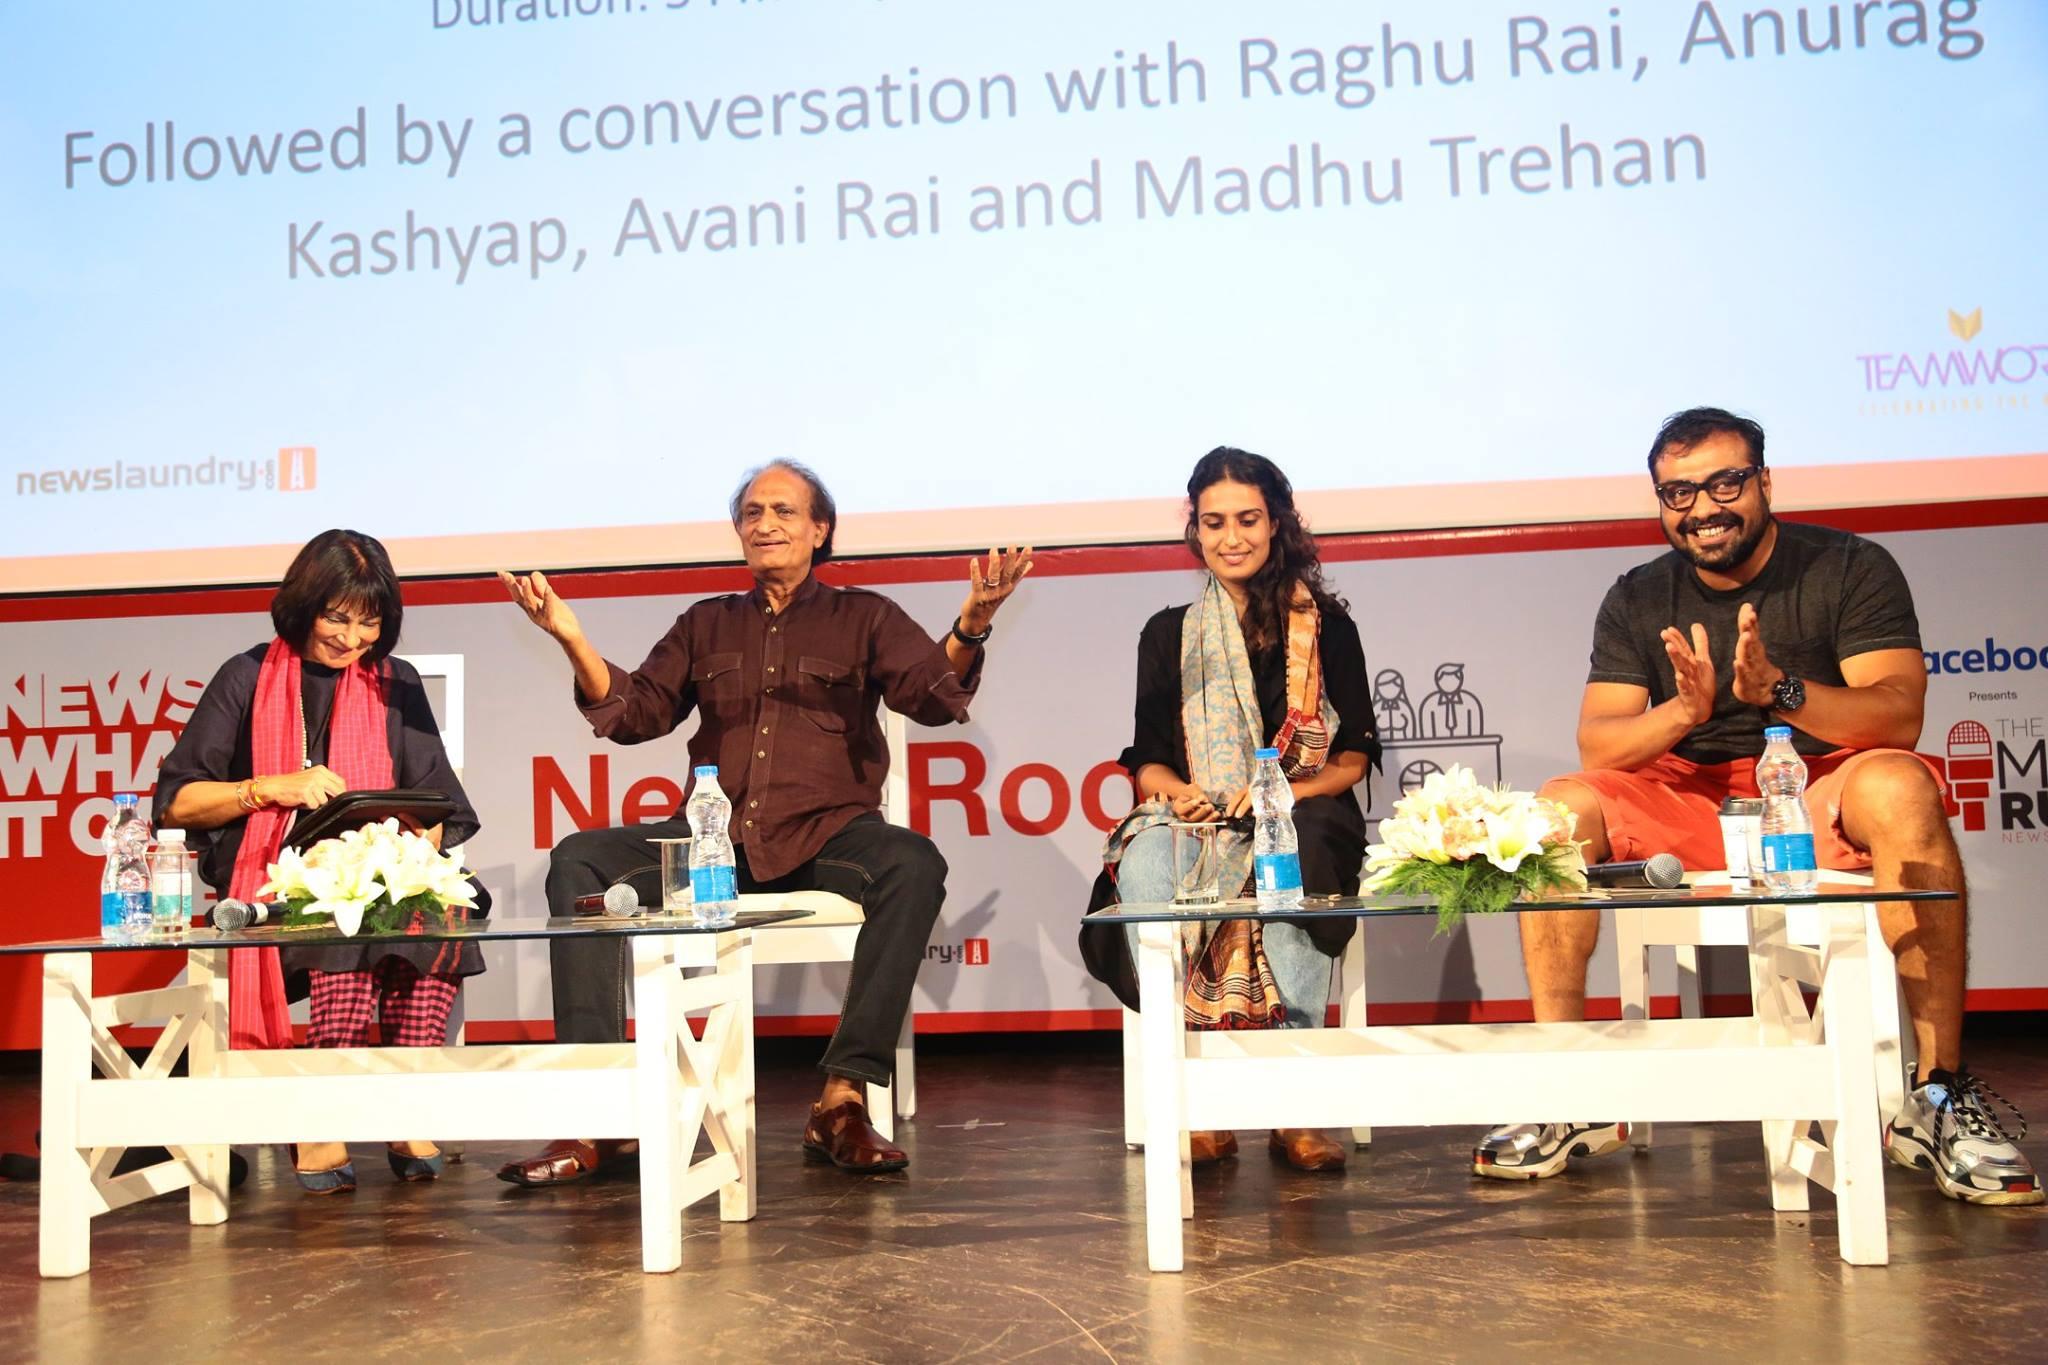 Raghu Rai- An Unframed Portrait